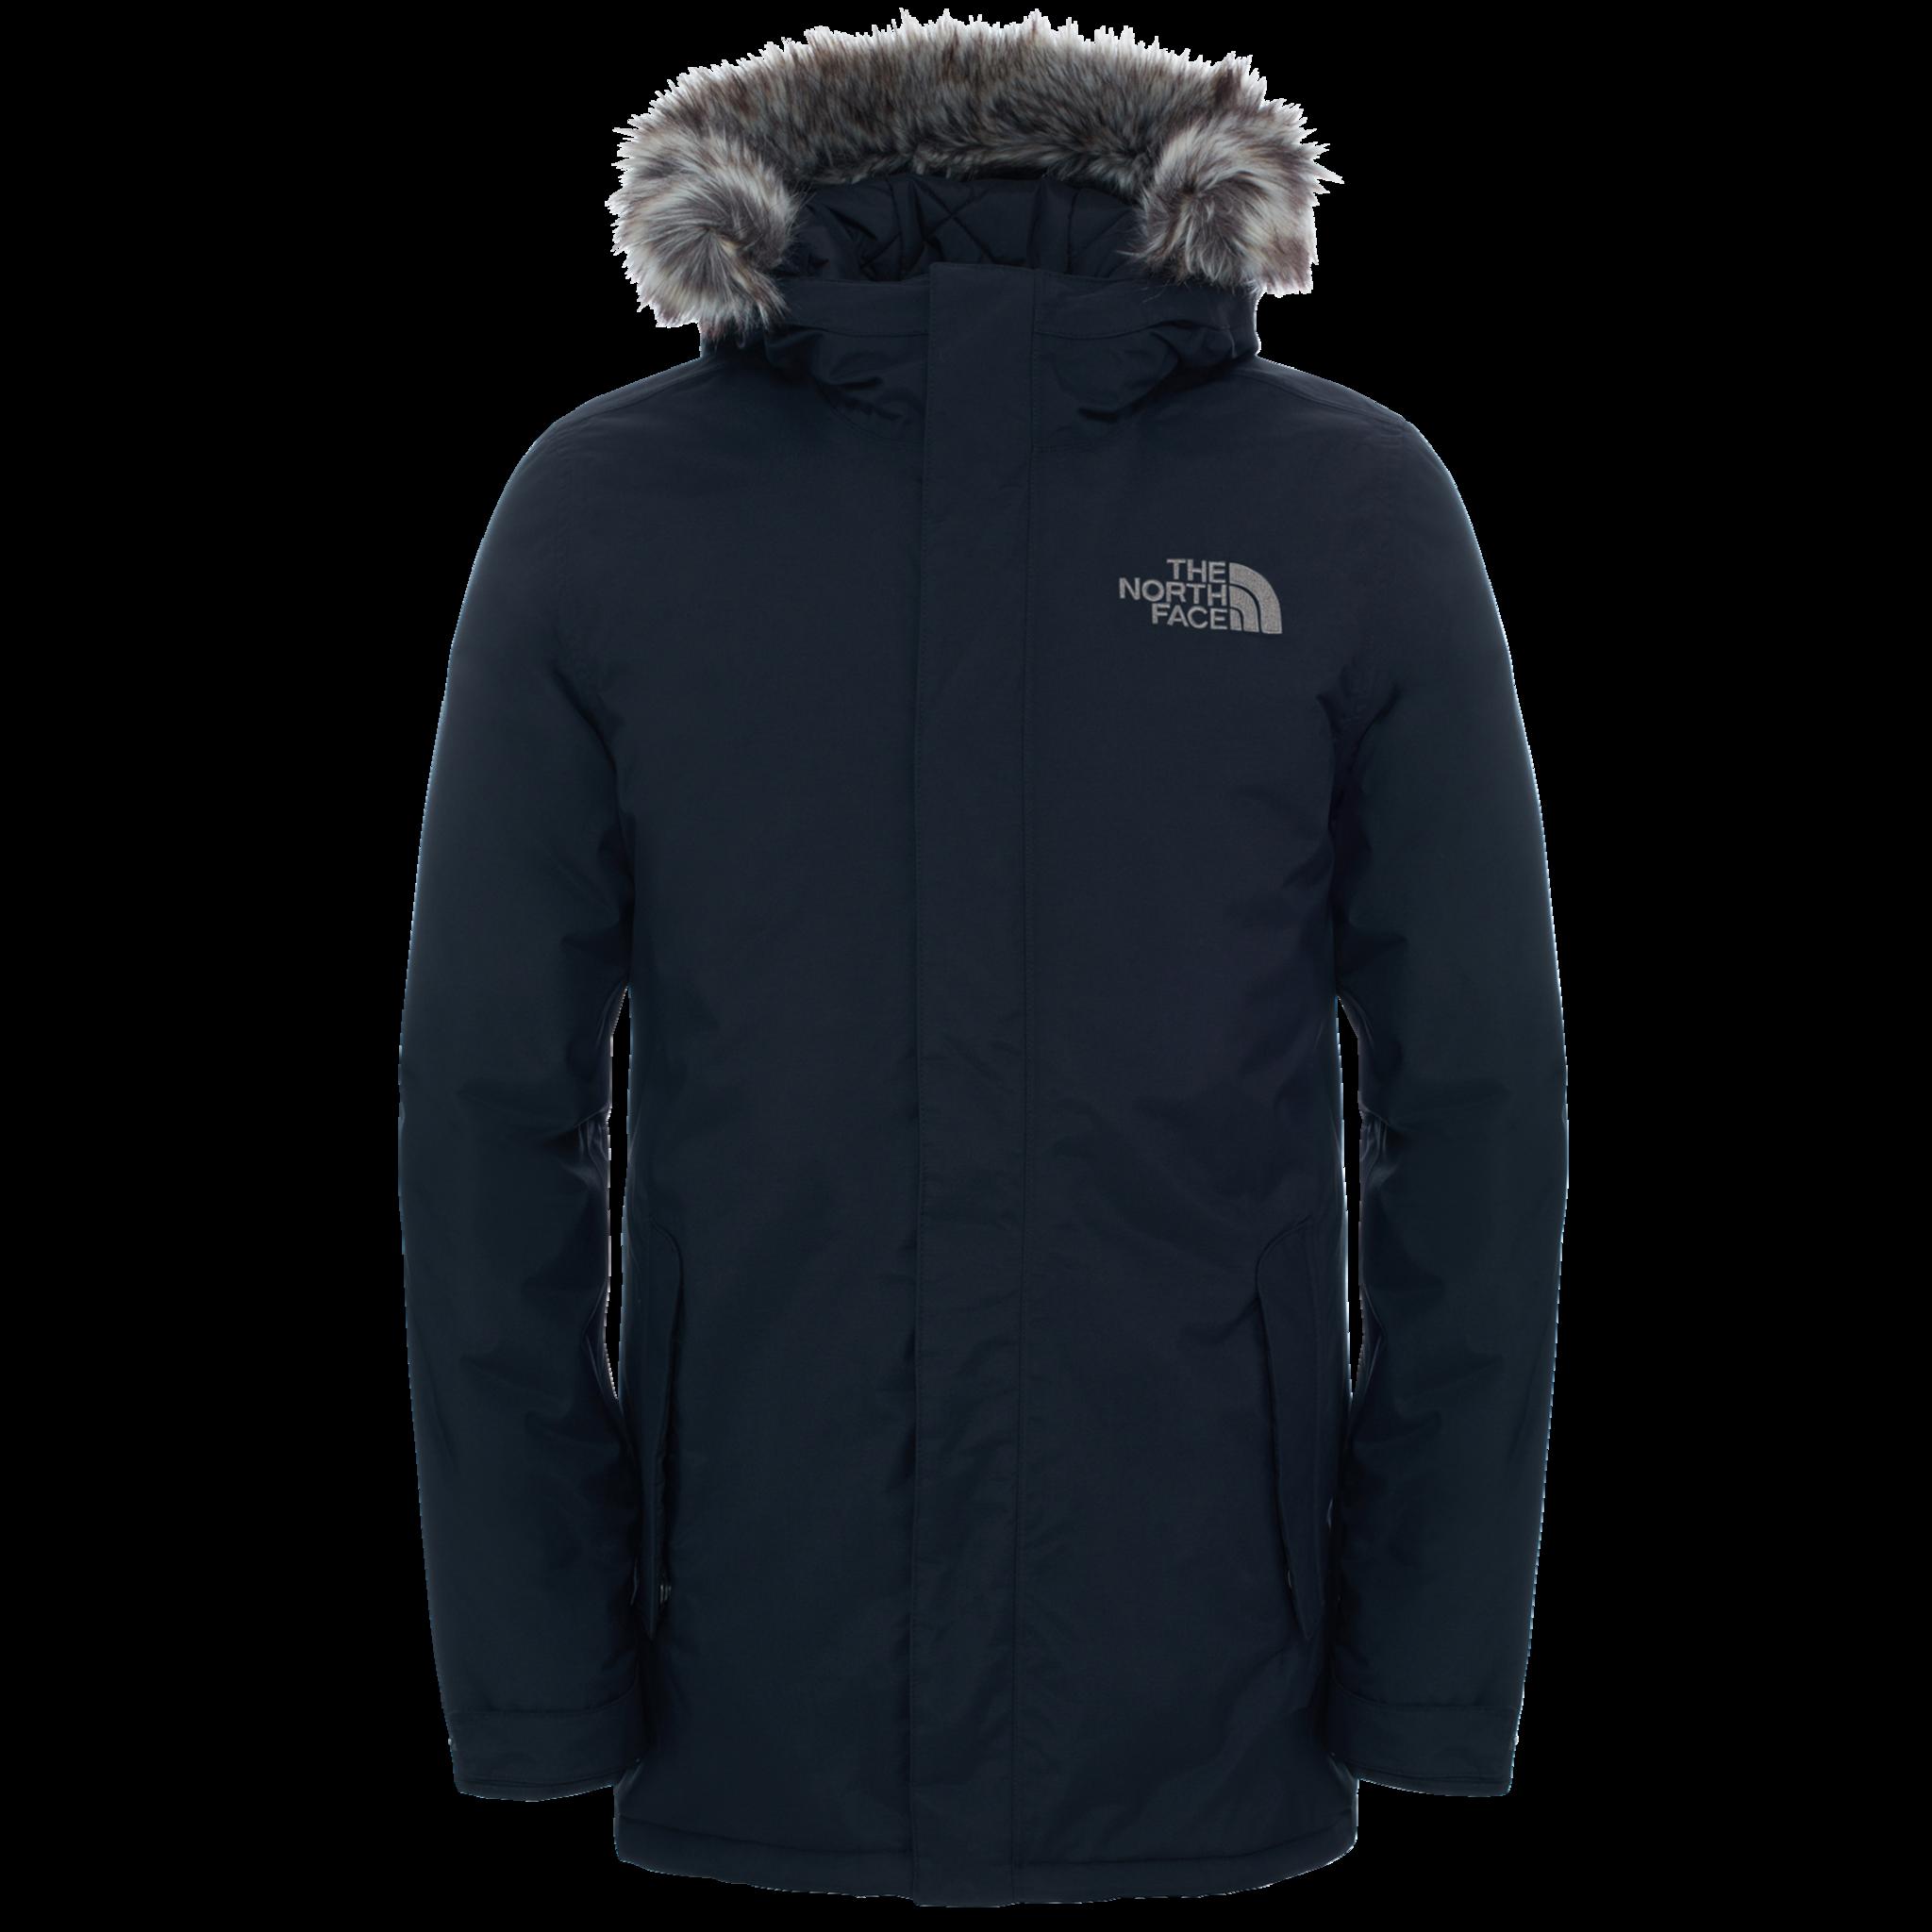 The North Face Zaneck Jacket, vinterjakke herre Svart